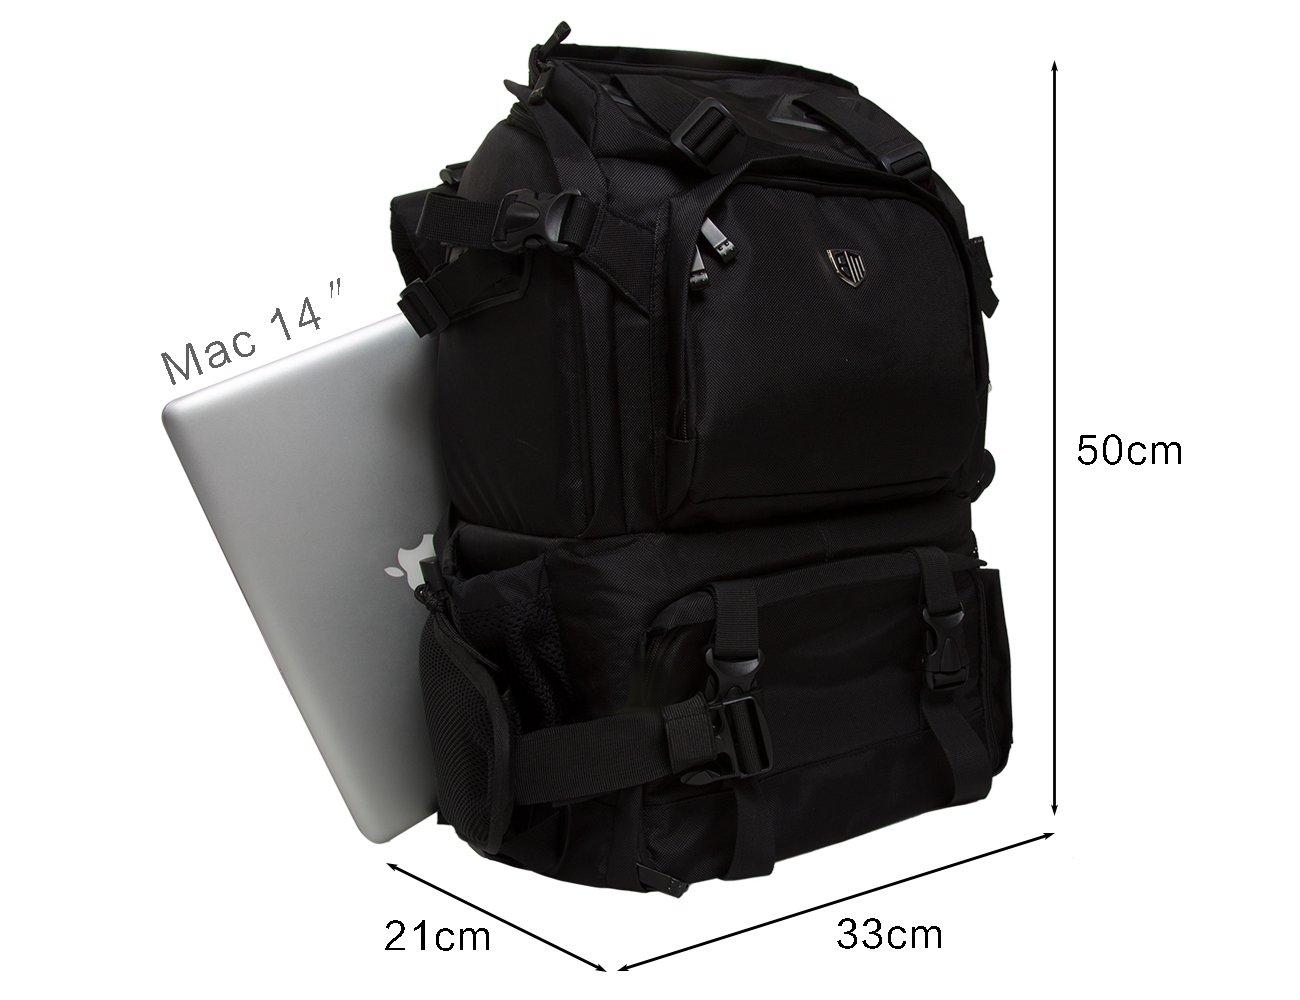 Black BAGASMART Anti-theft Professional Gear Backpack SLR//DSLR Camera Bag for 70-200mm Lens /& 15 Macbook Pro with Waterproof Rain Cover